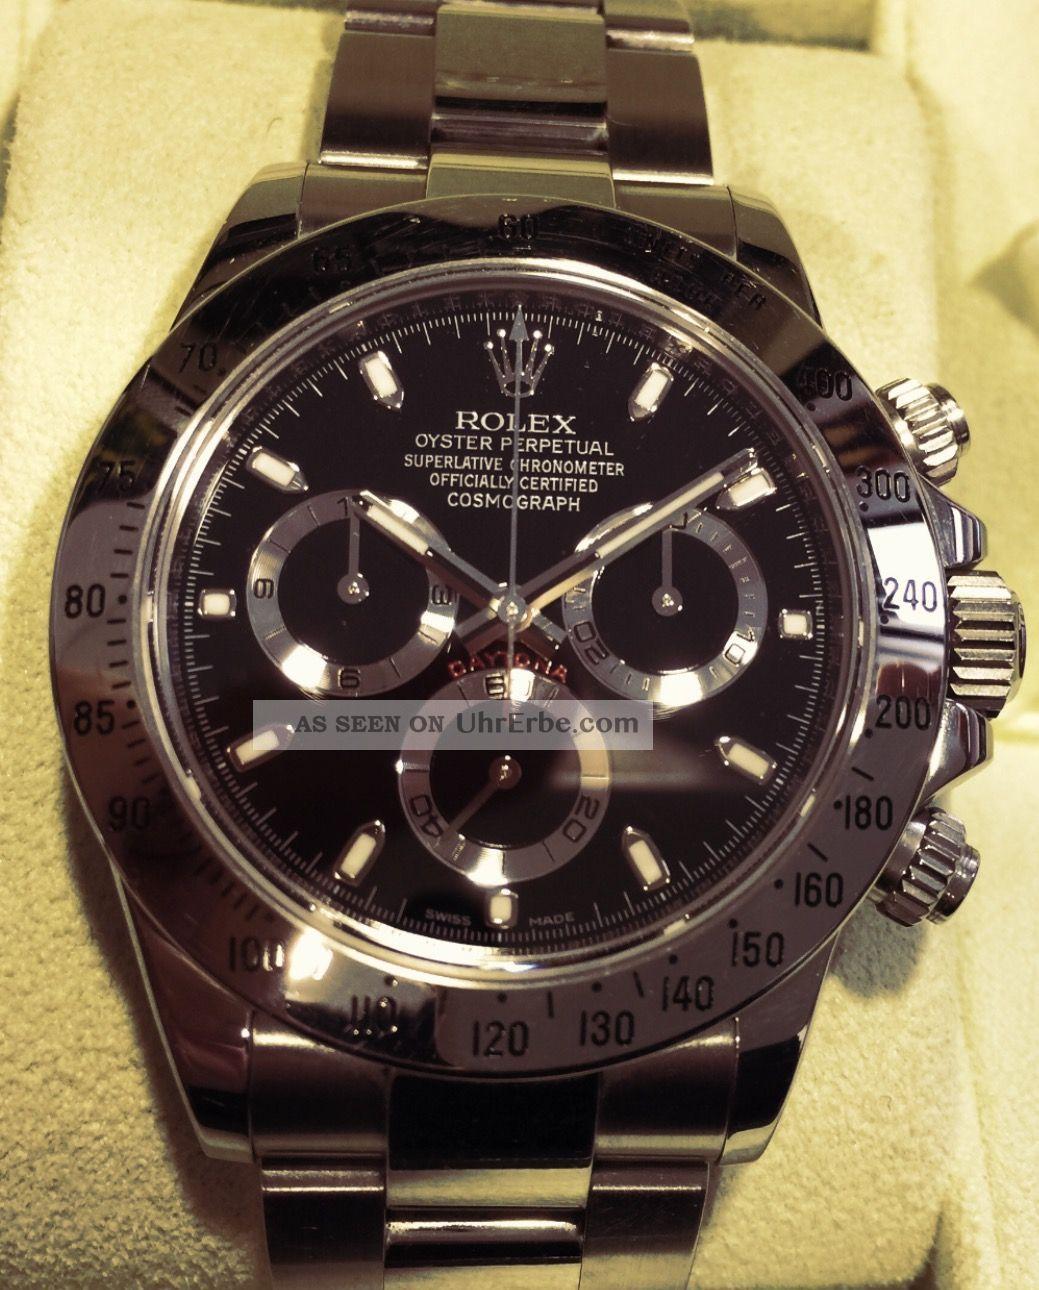 Rolex Oyster Perpetual Cosmograph Daytona Armbanduhr Für Herren (116520) 02/2012 Armbanduhren Bild